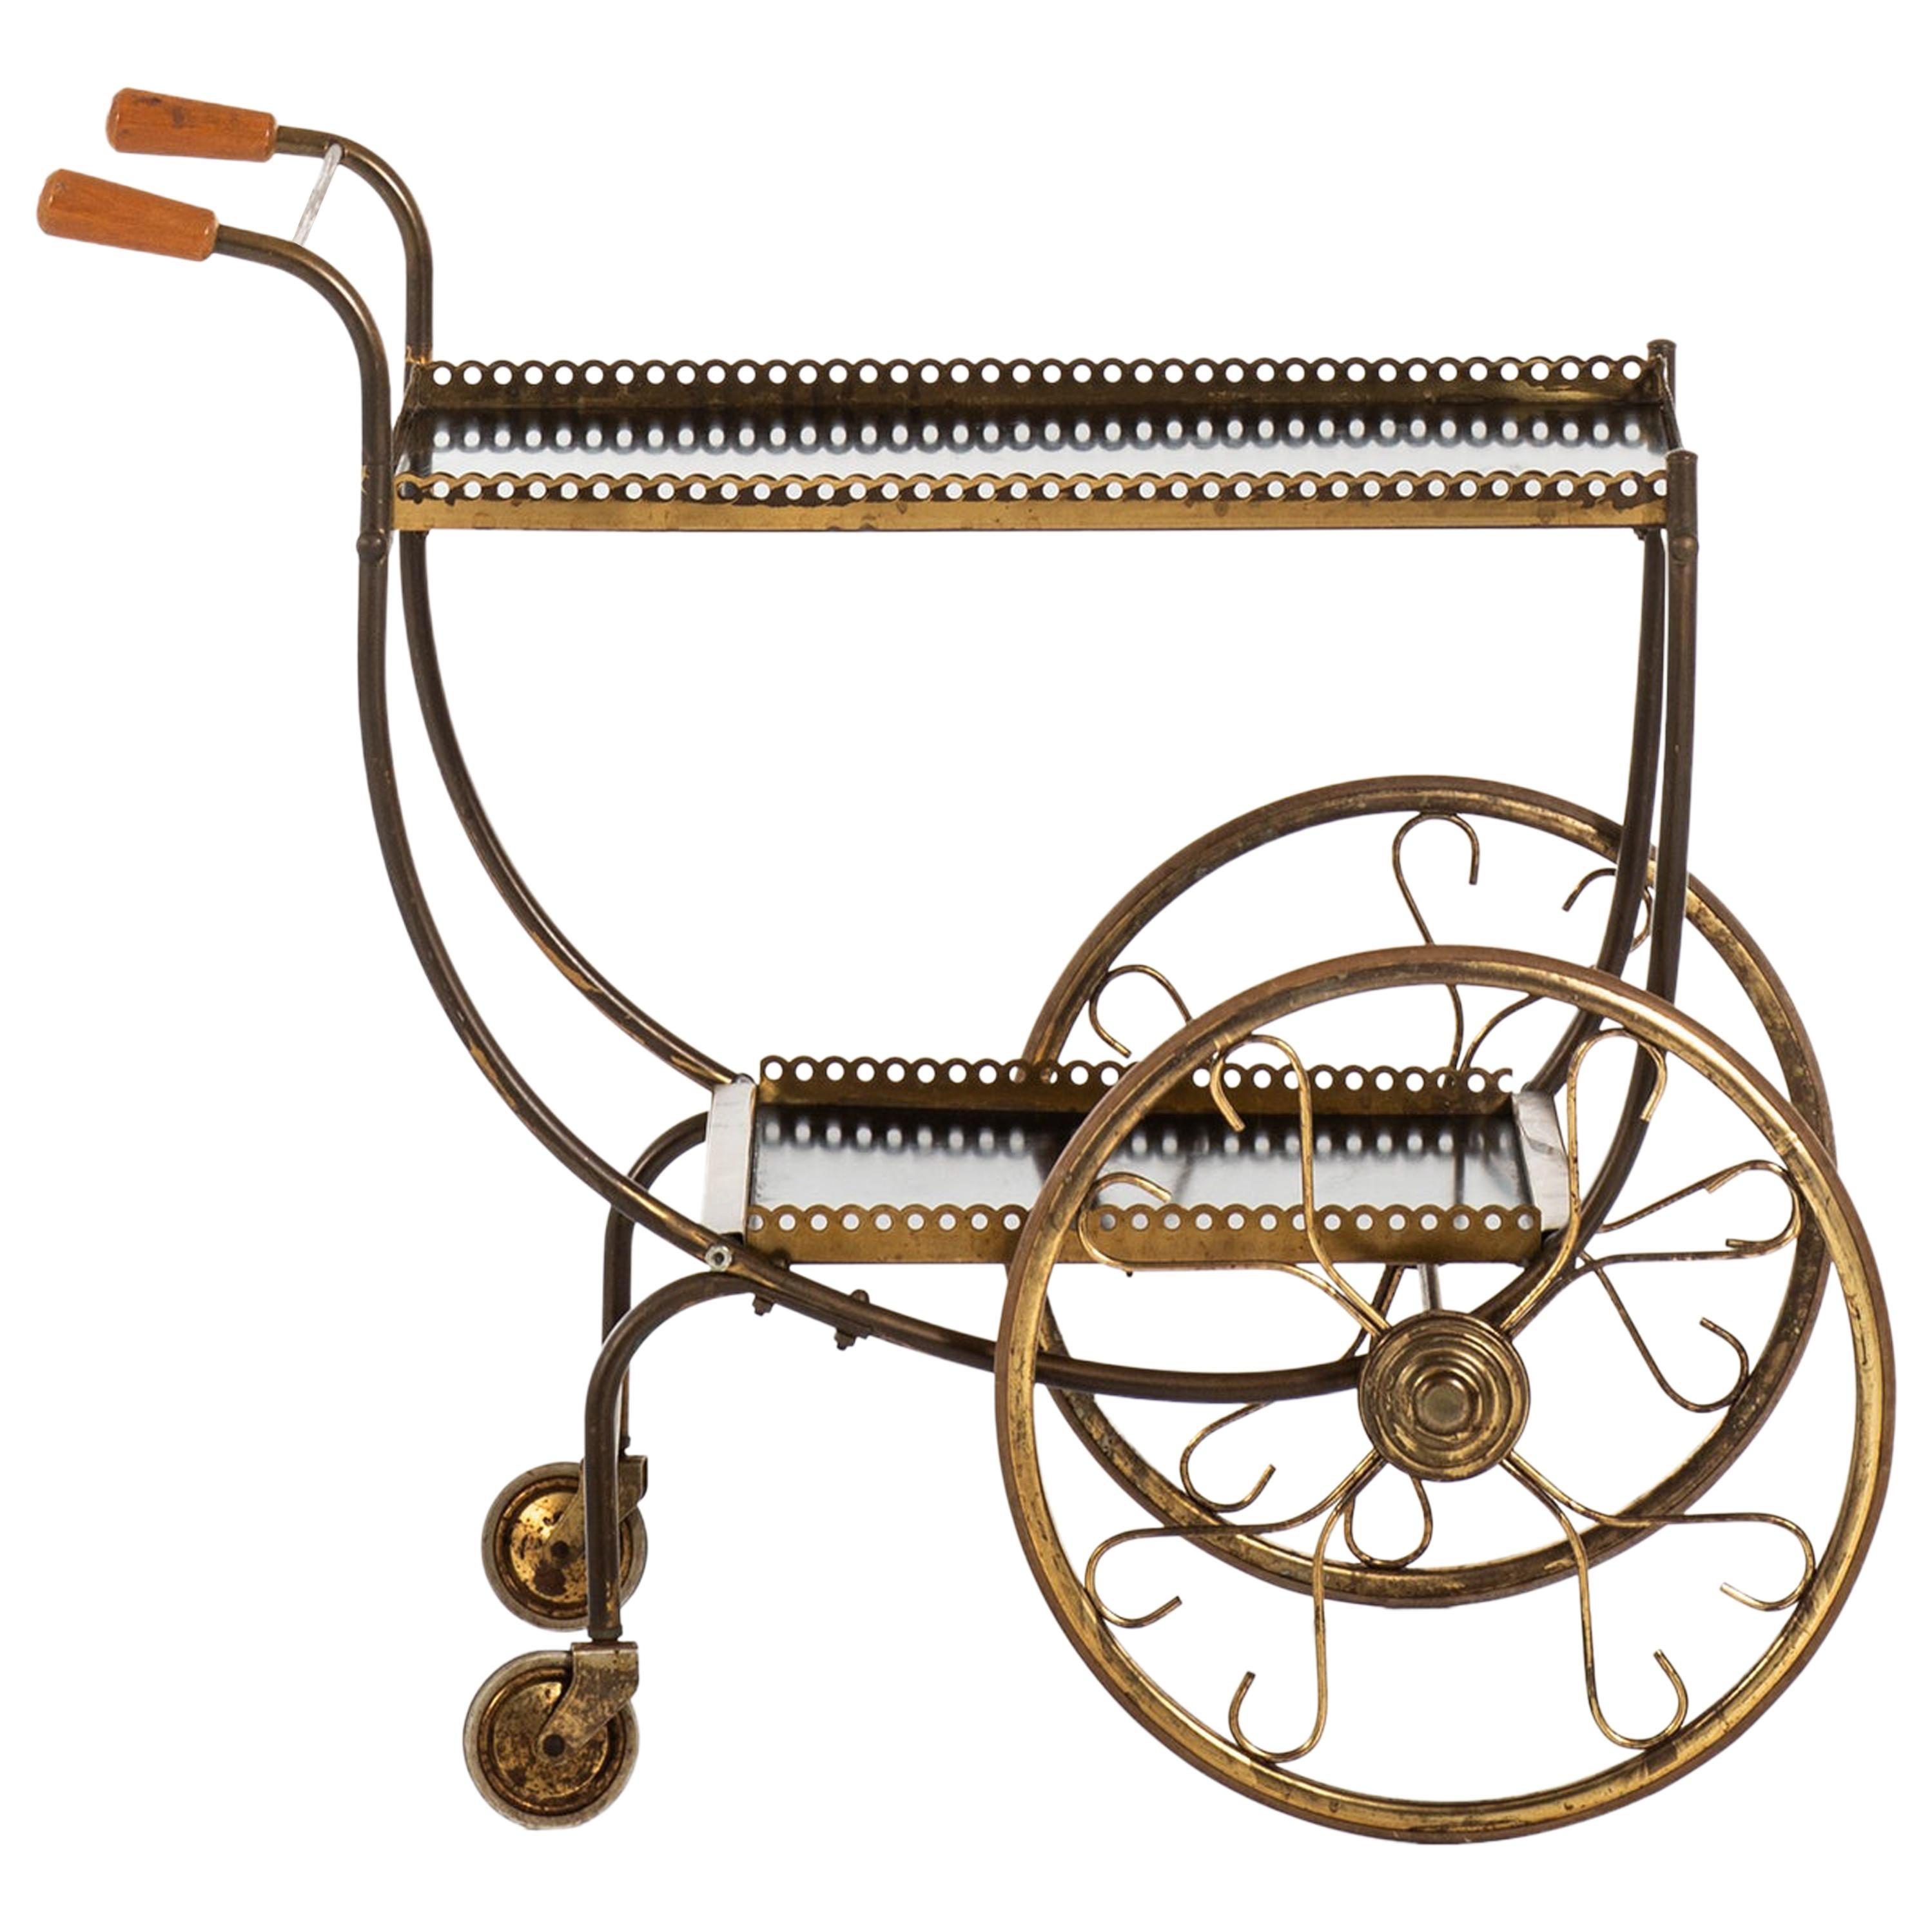 Josef Frank Trolley Produced by Svenskt Tenn in Sweden